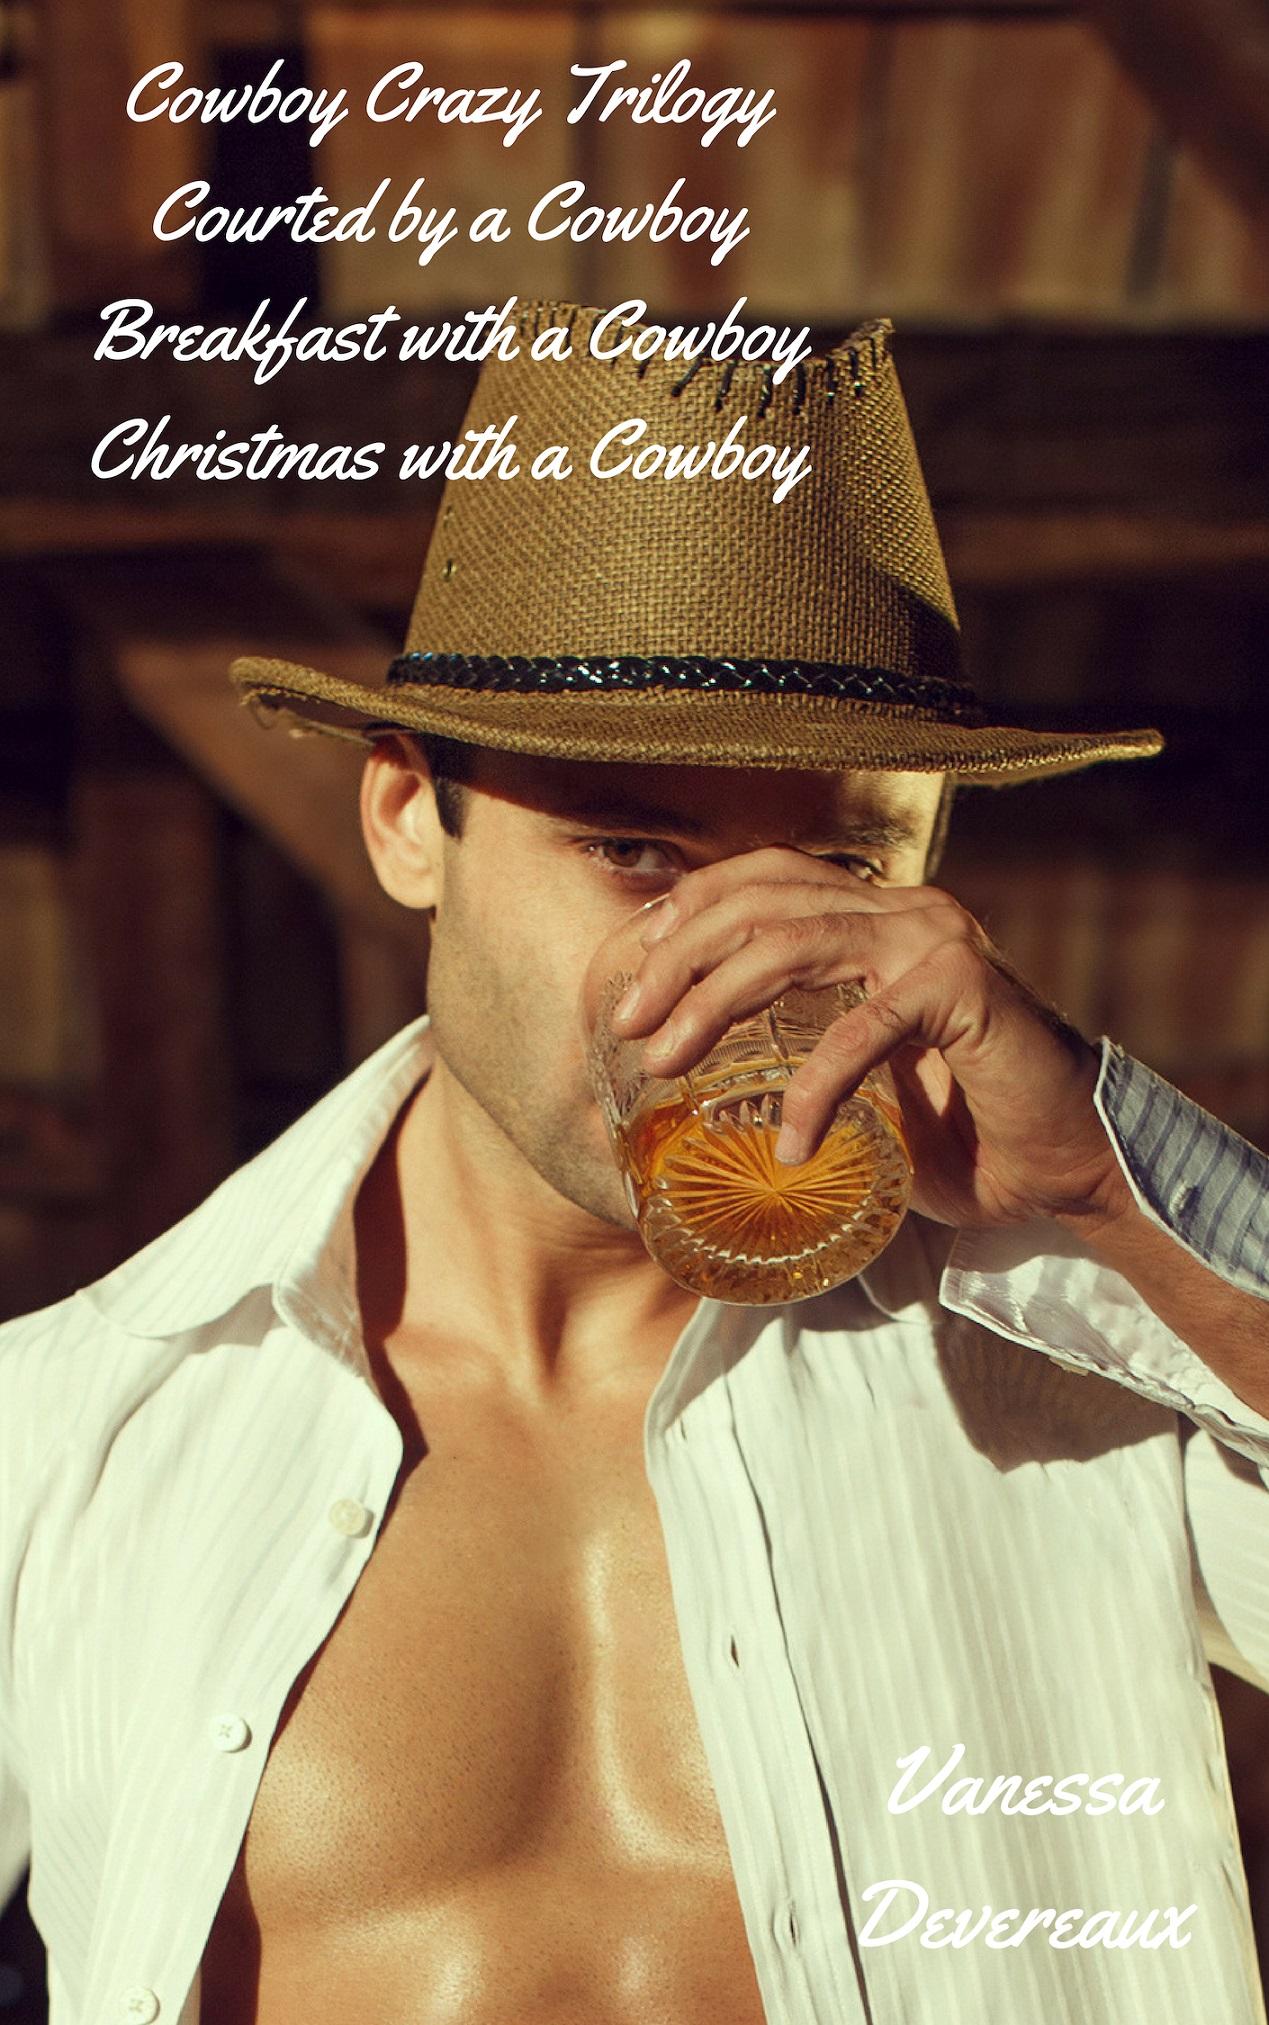 Cowboy Crazy Trilogy2